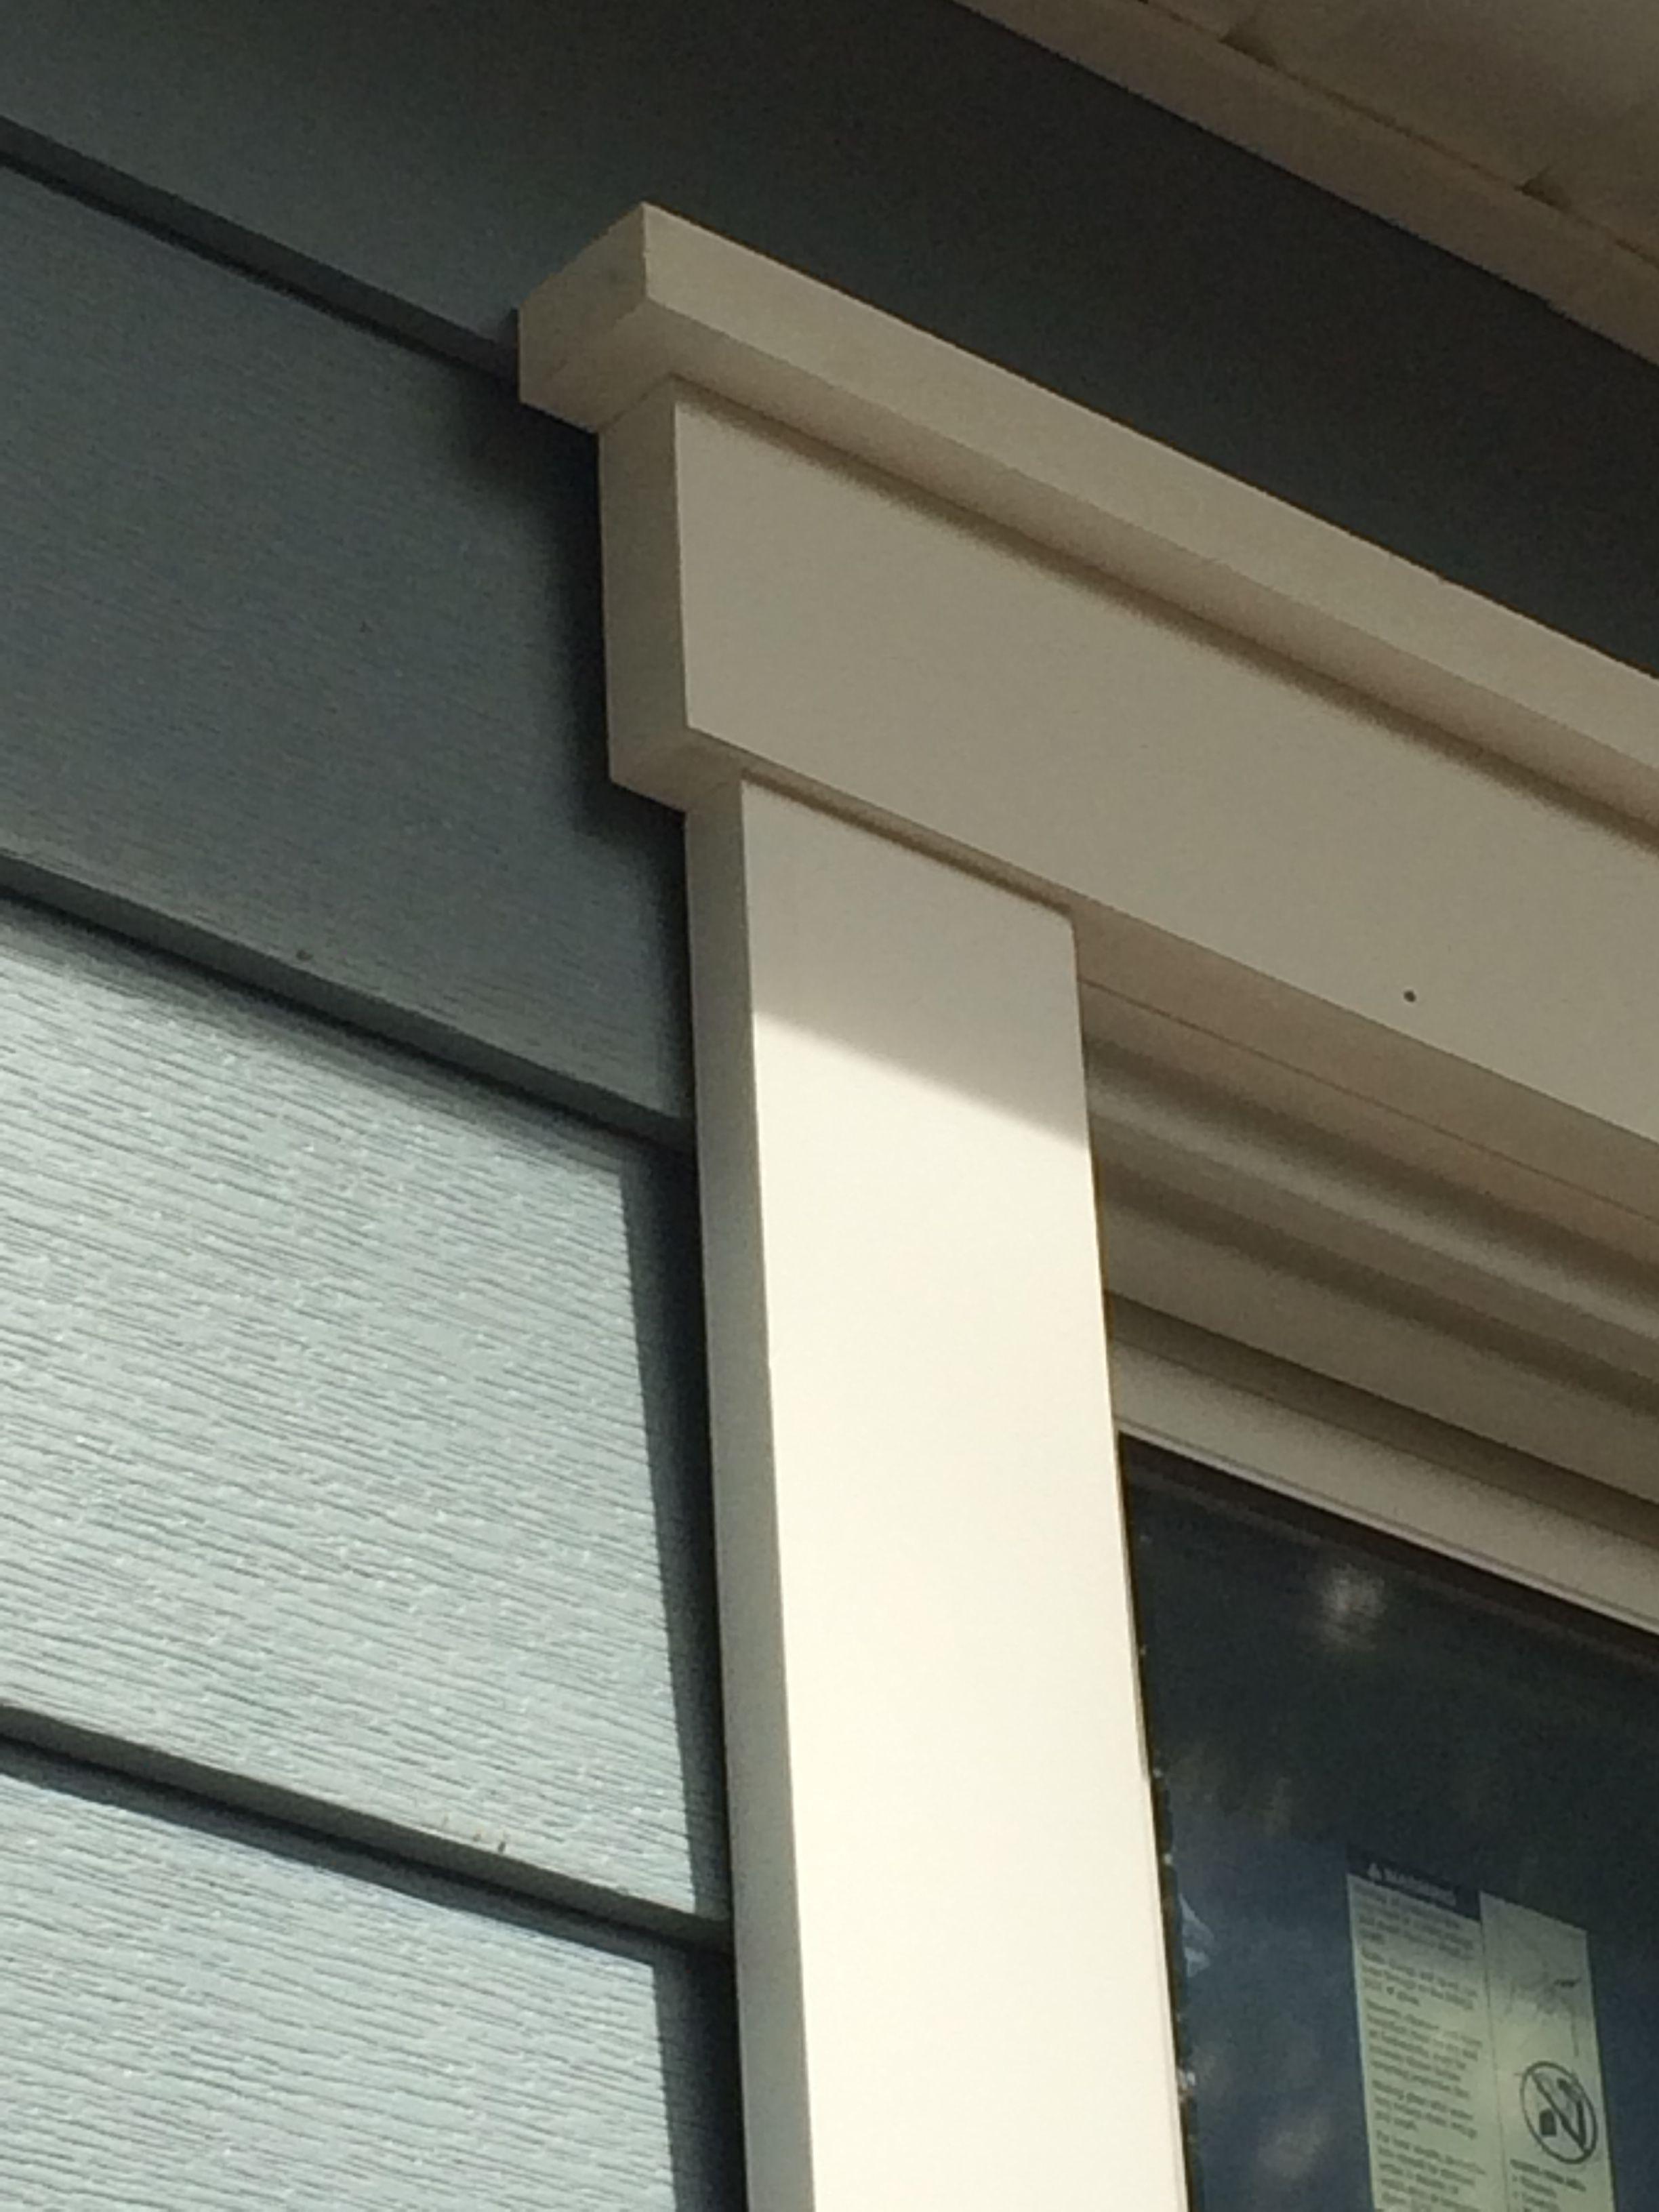 Image Result For Decorative Window Trim With Lap Siding Window Trim Exterior Farmhouse Window Trim Exterior Siding Colors